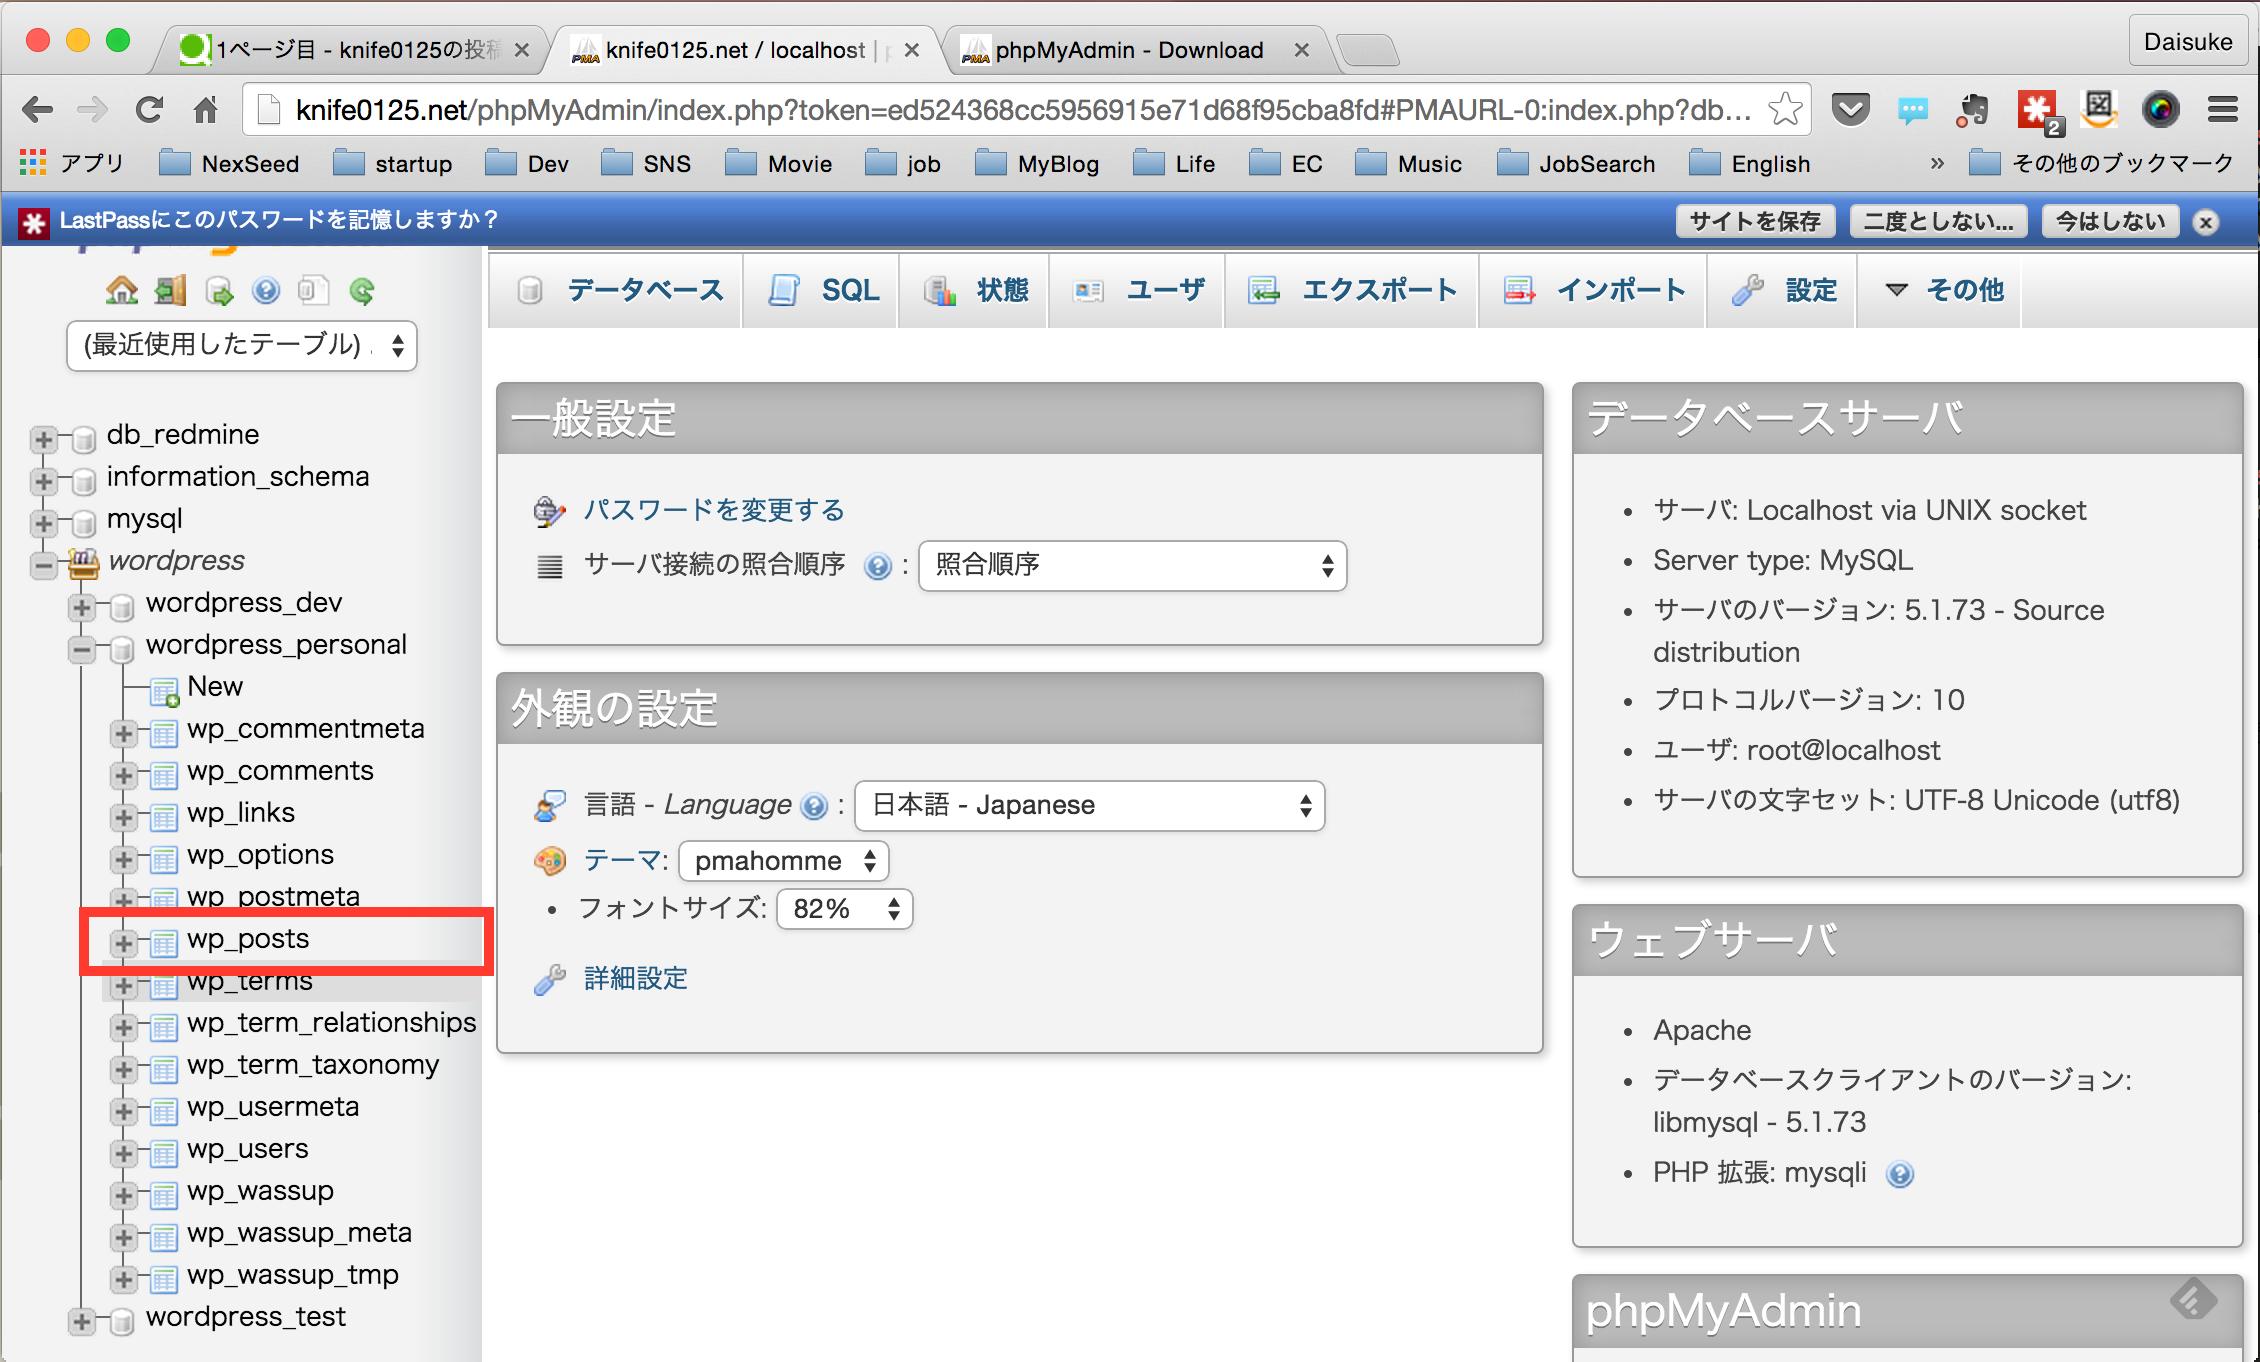 PHPMyAdmin_Export_03.png